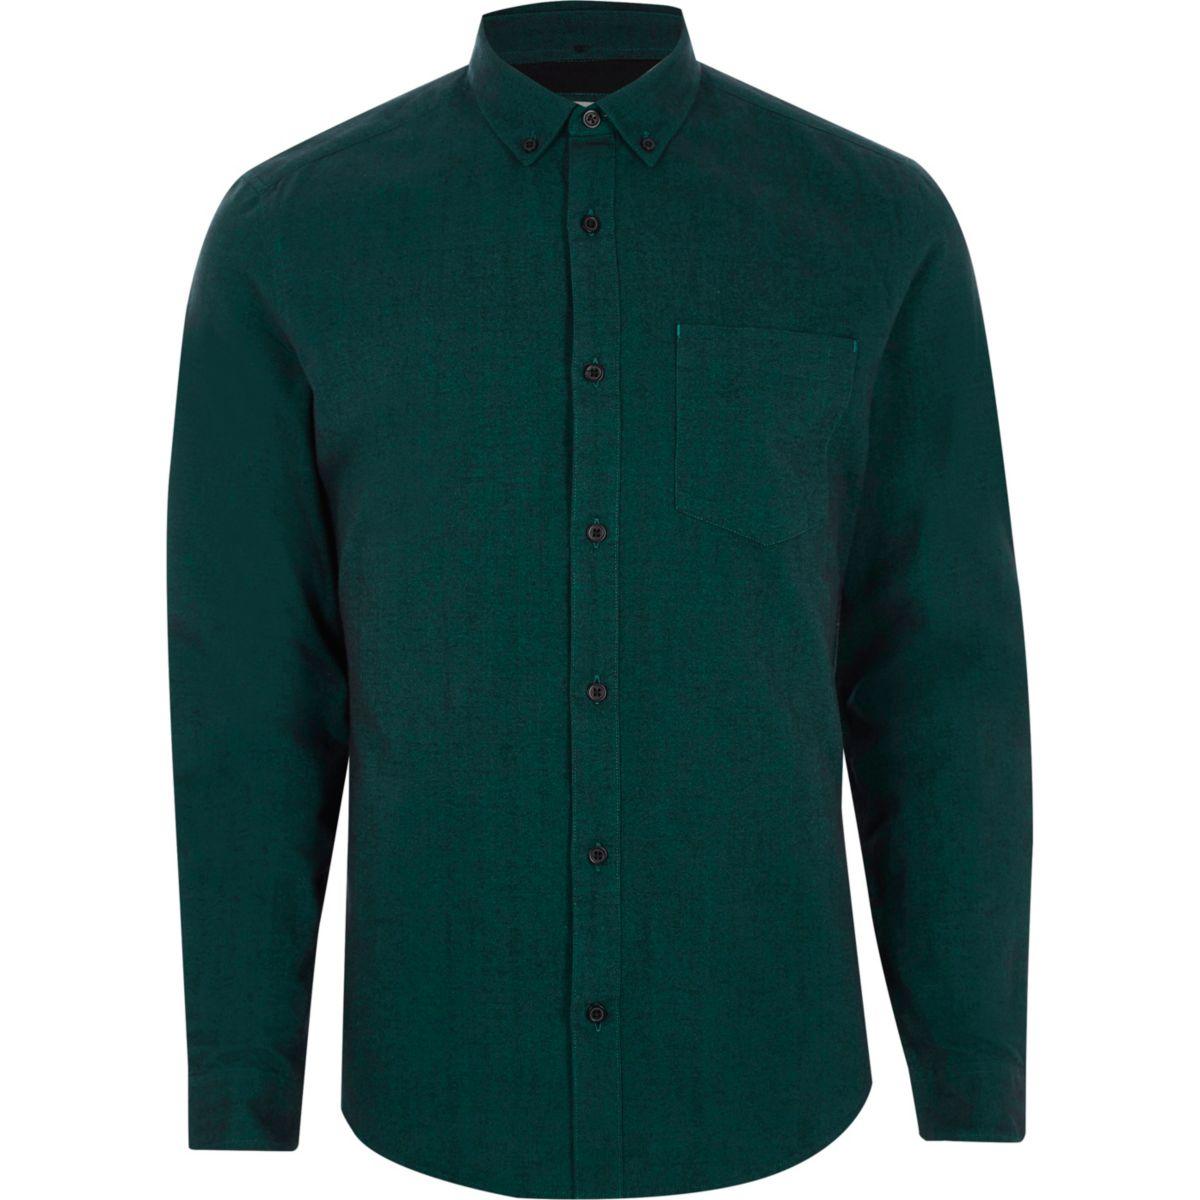 Teal slim fit long sleeve oxford shirt shirts sale men for Men oxford slim fit long sleeve shirt